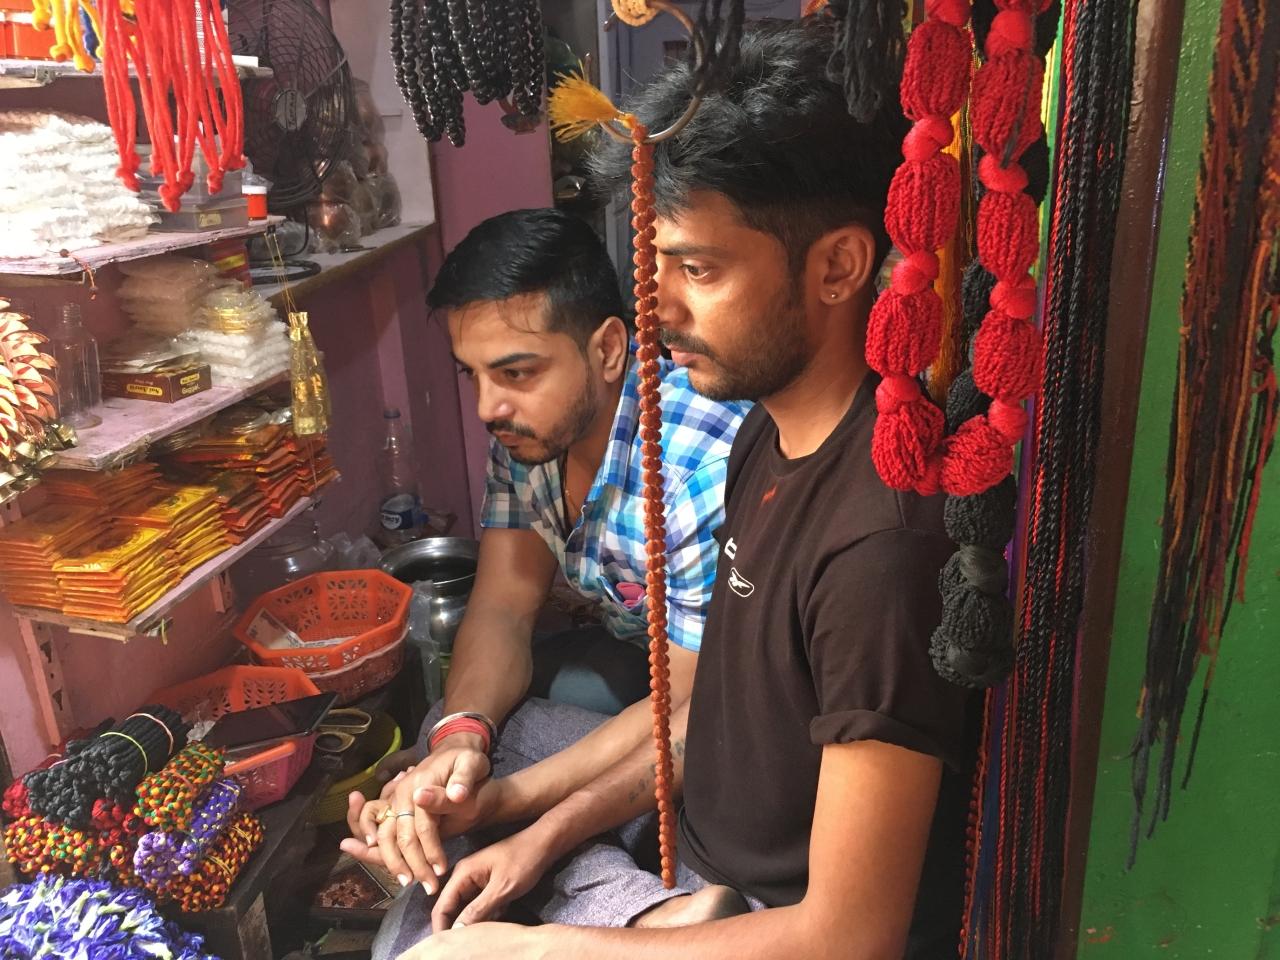 (left) Pradeep Nath Upadhyay